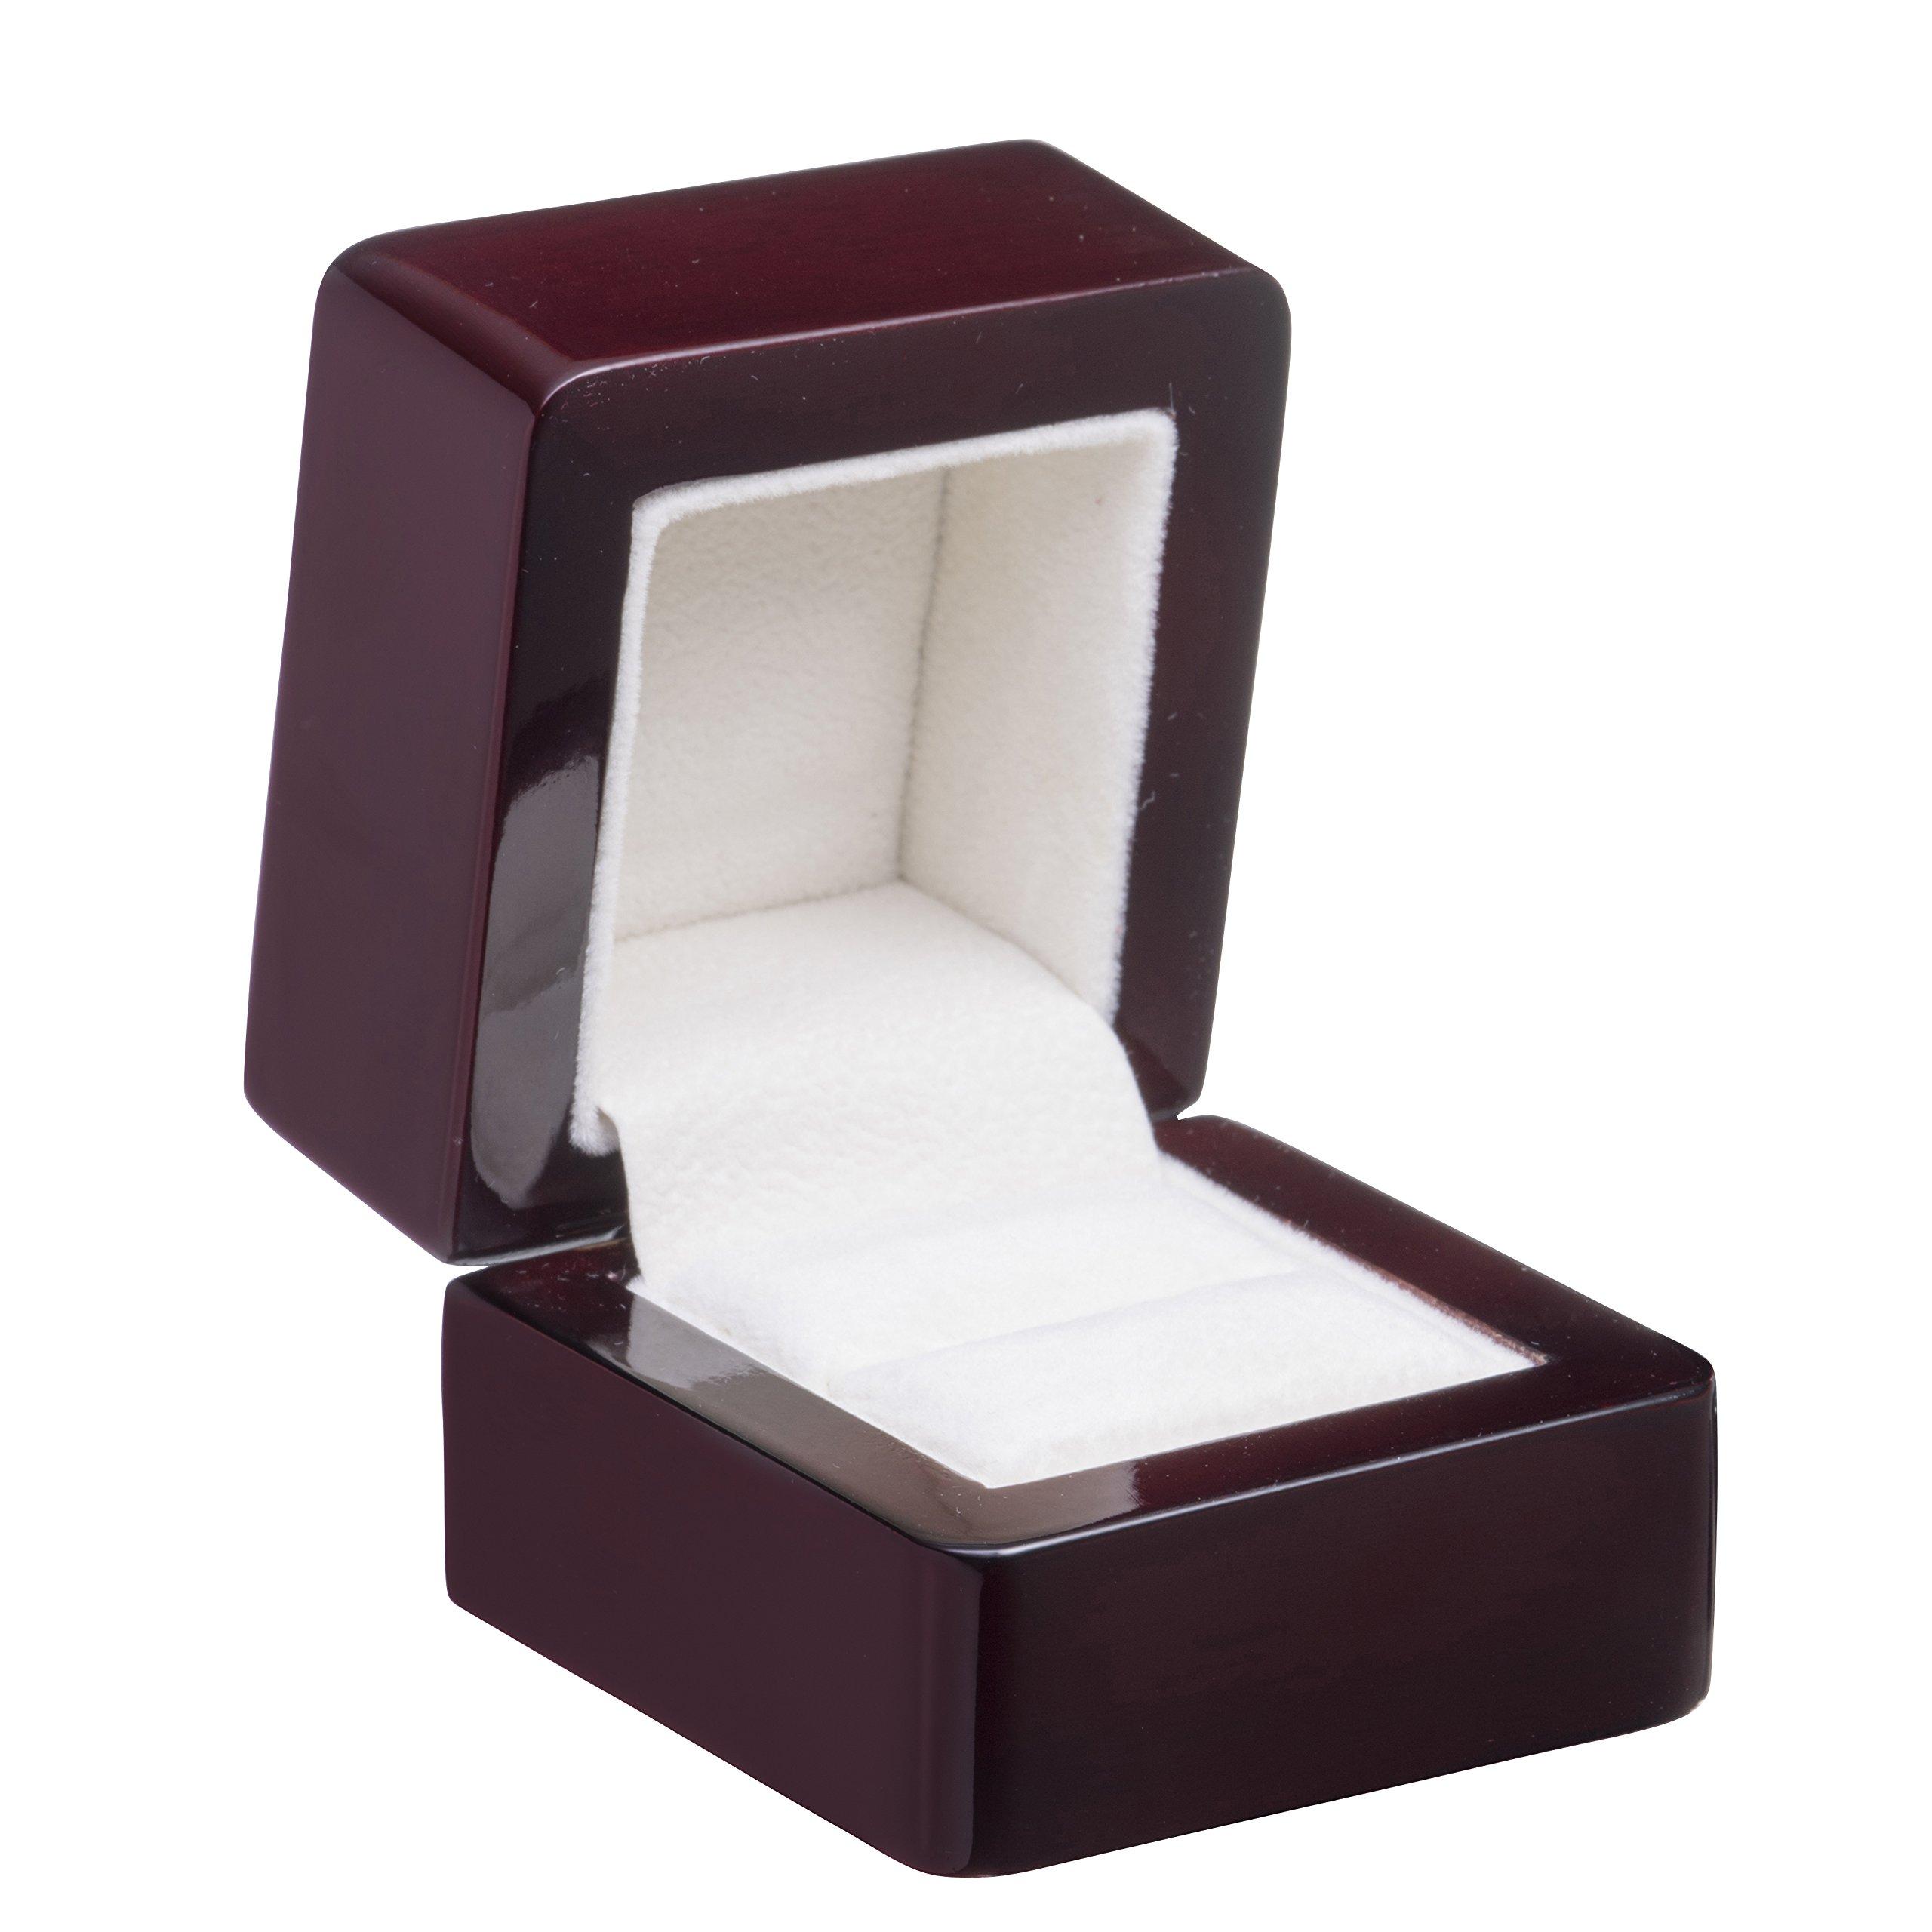 Allure Regal Ring Box, Rosewood